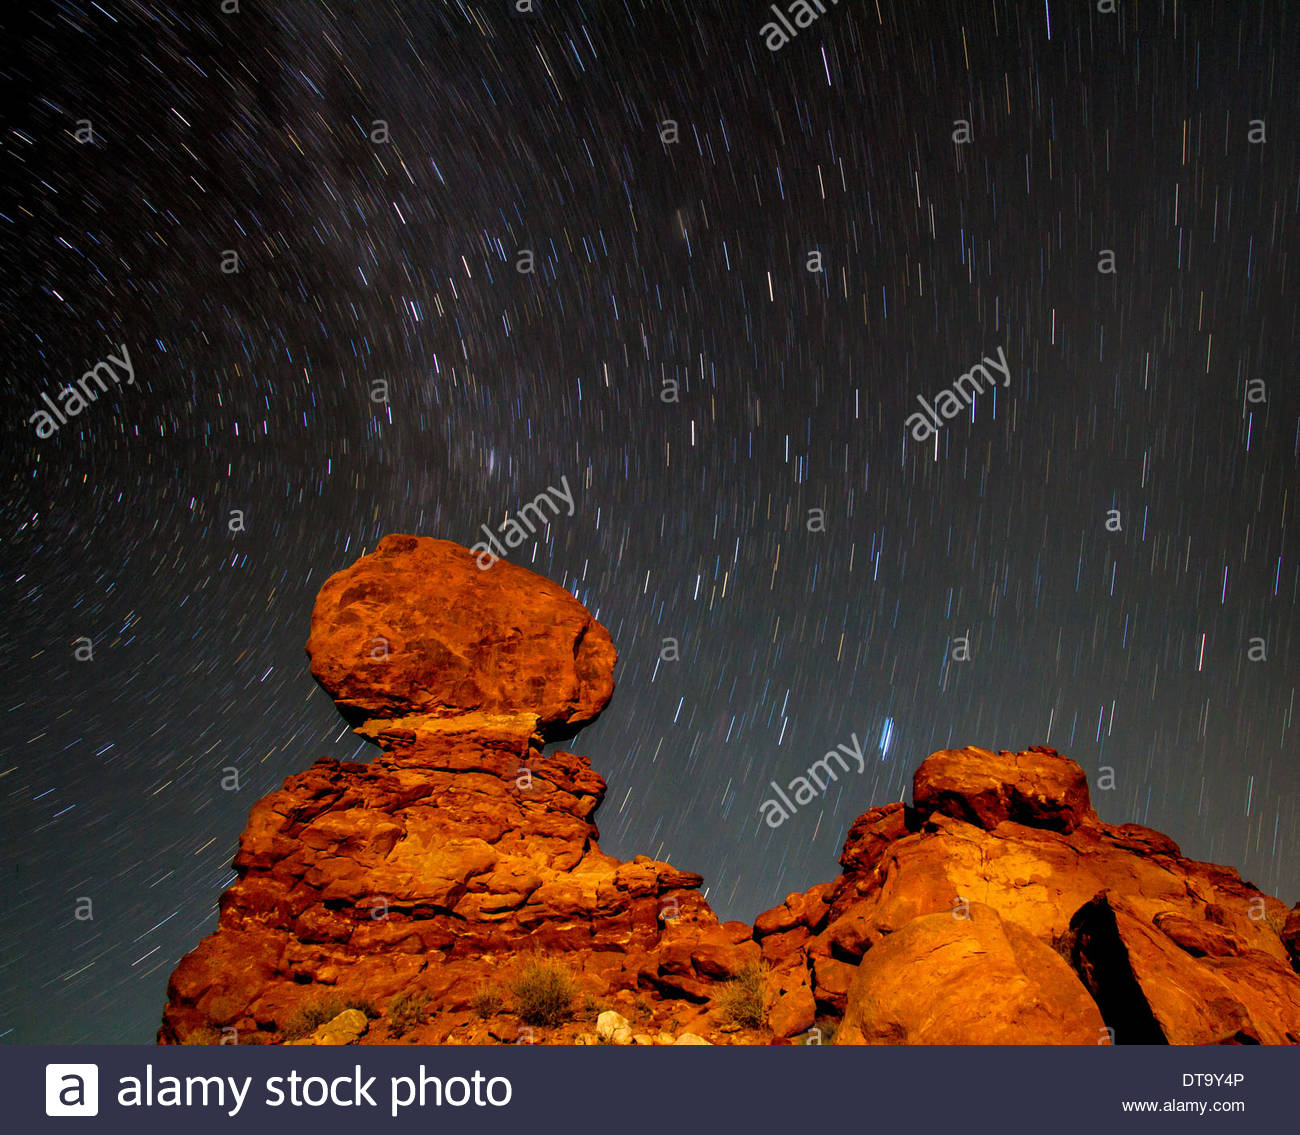 Stars Over Balanced Rock, Arches National Park, Utah, USA - Stock Image